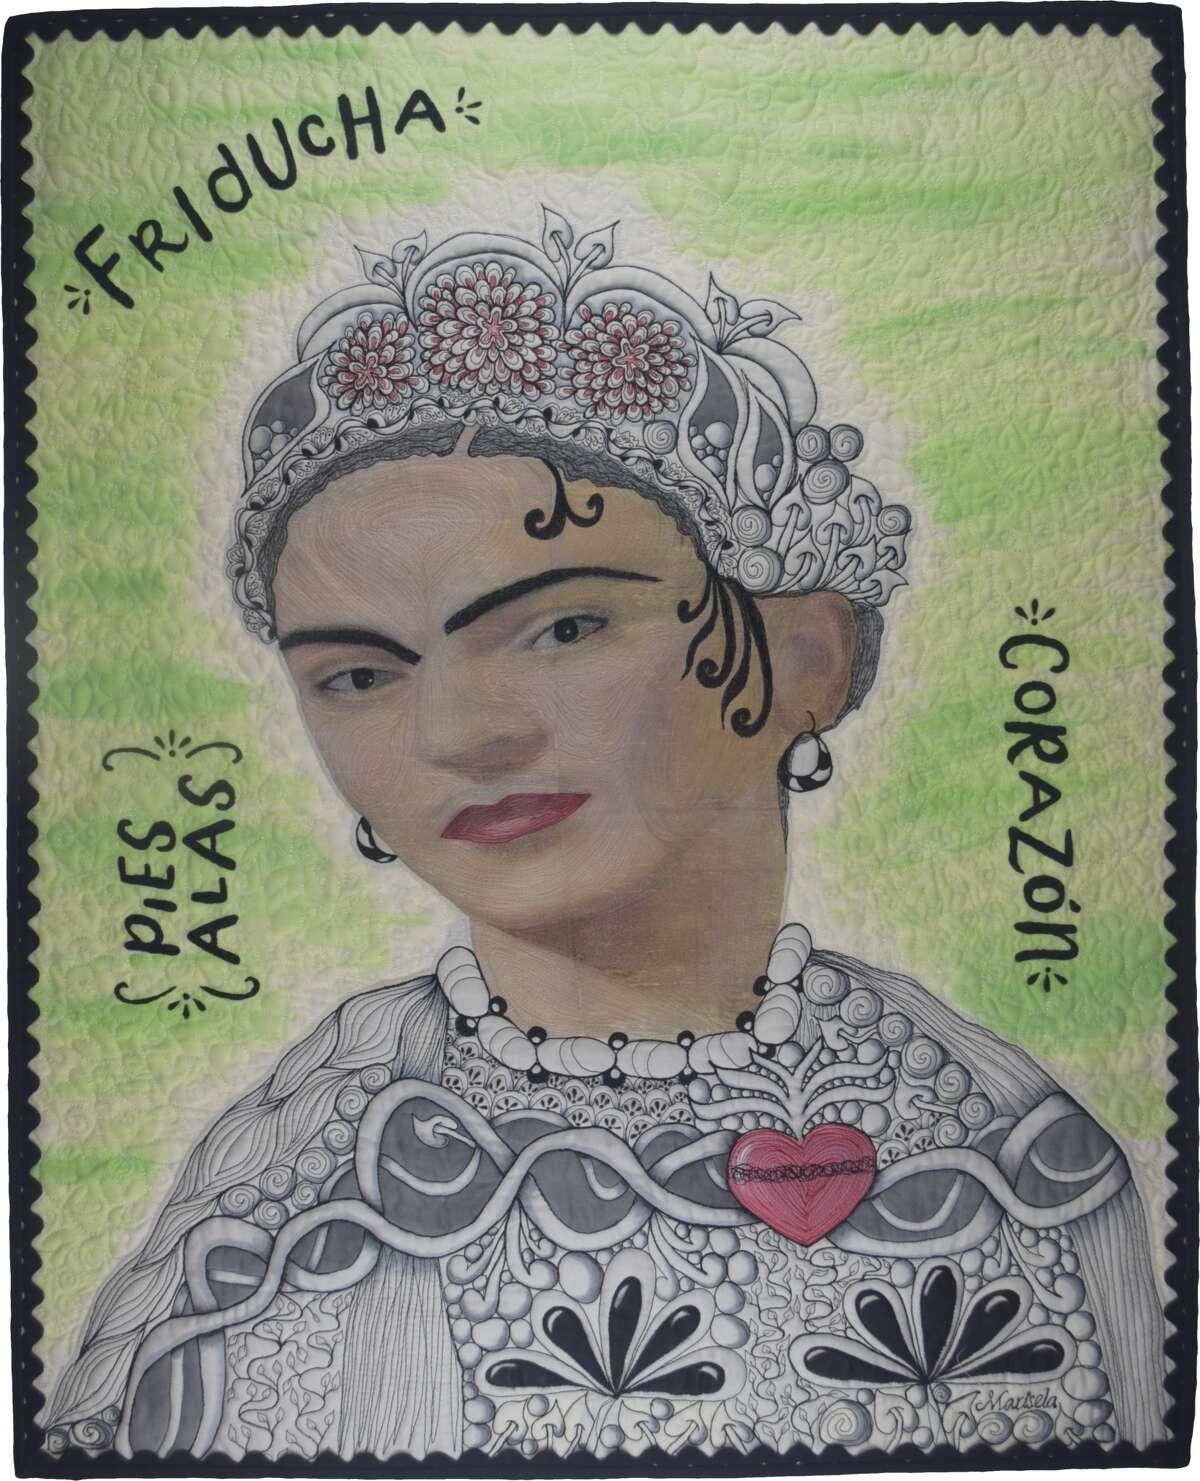 """Frida Kahlo,"" by Marisela Rumberg, honoring Mexican artist Frida Kahlo."